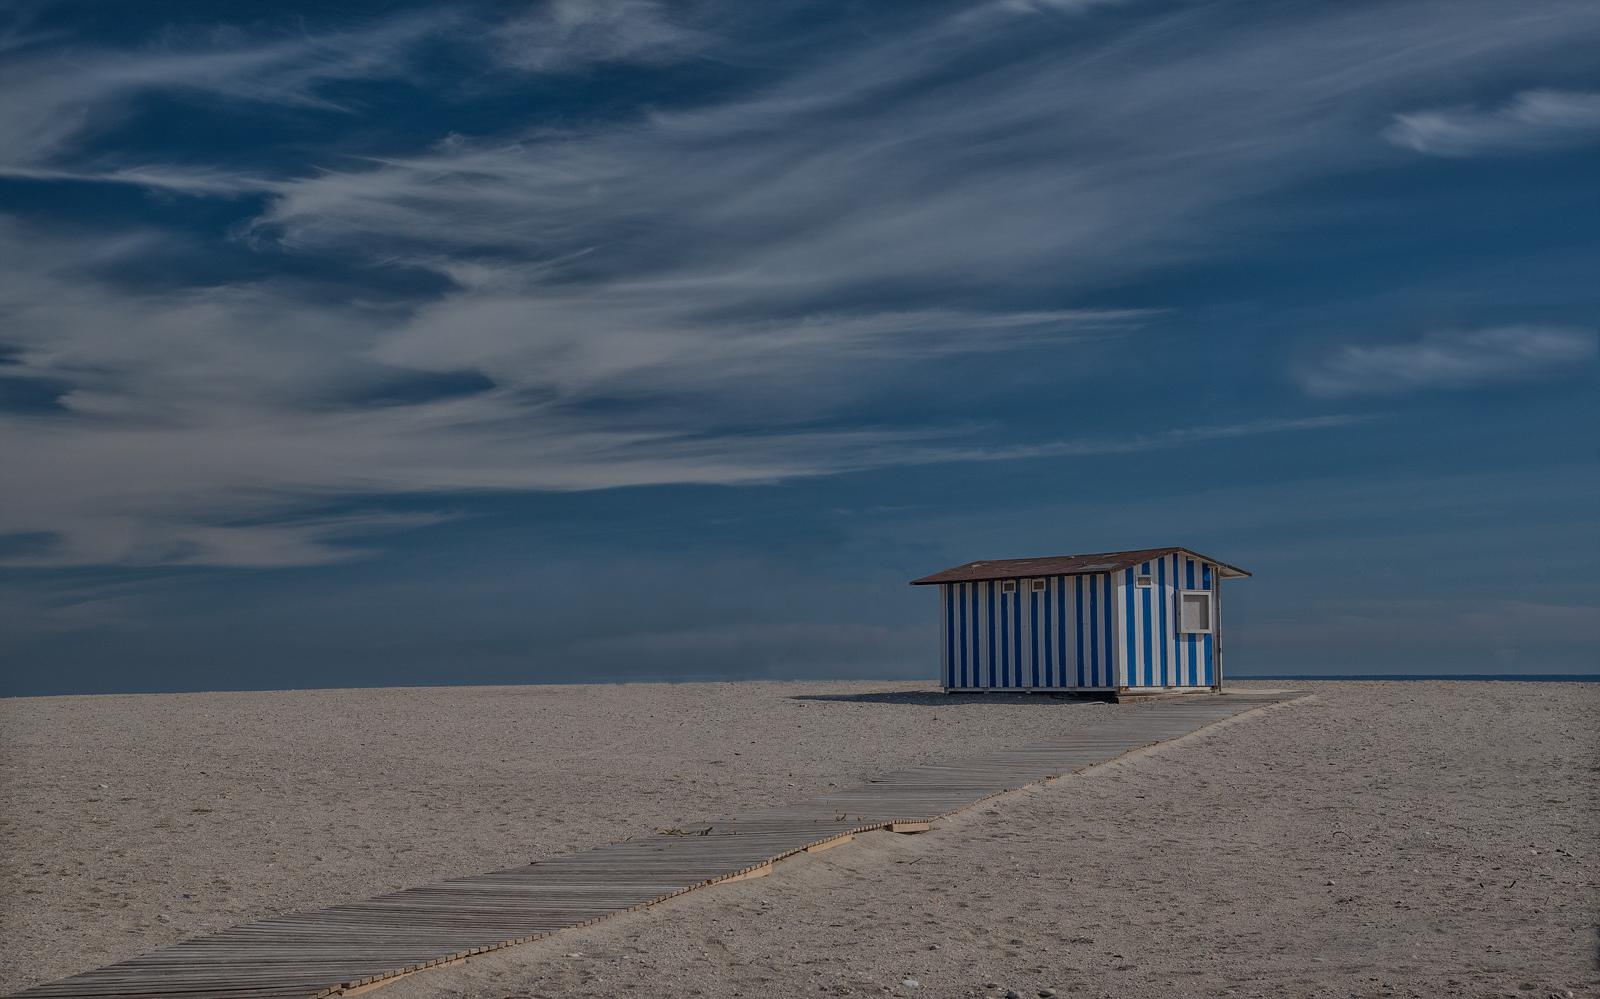 Beach hut-2